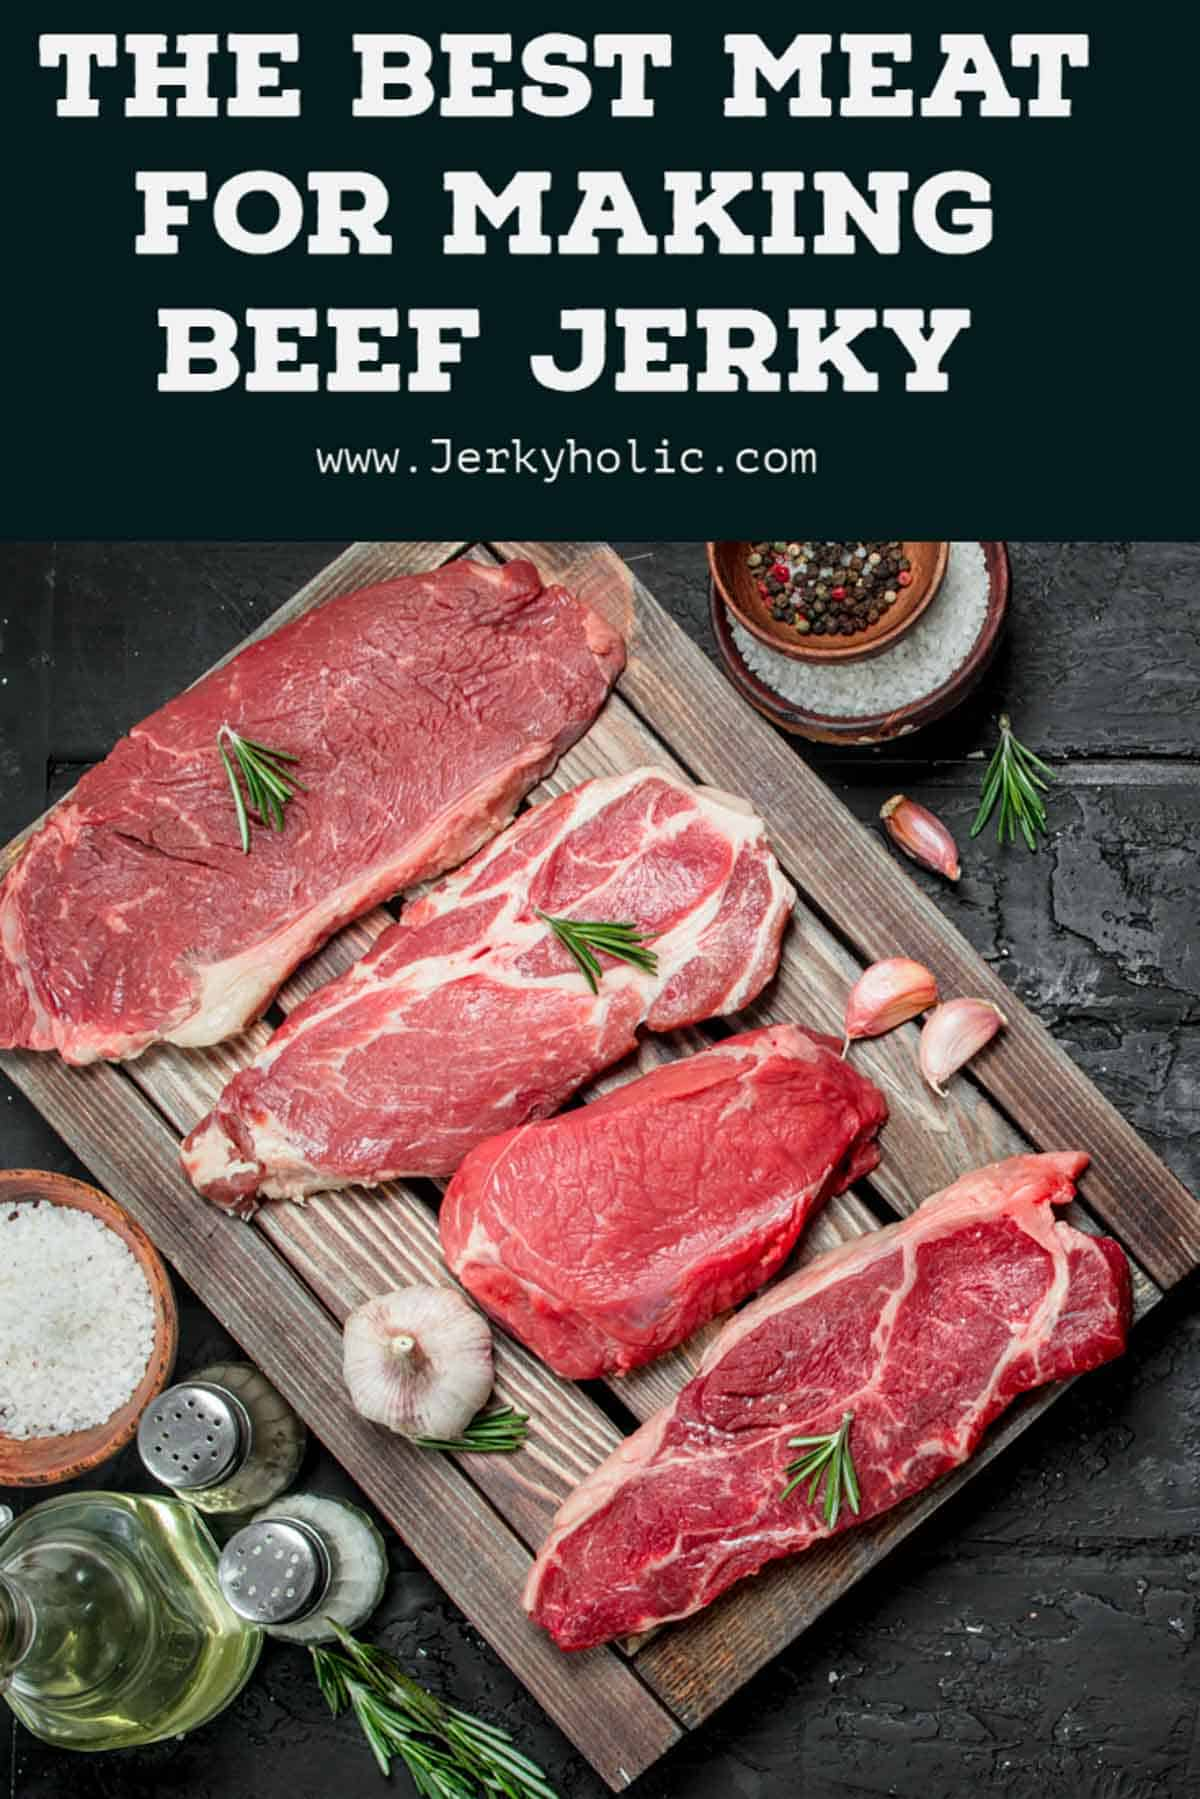 Best Meat for Beef Jerky